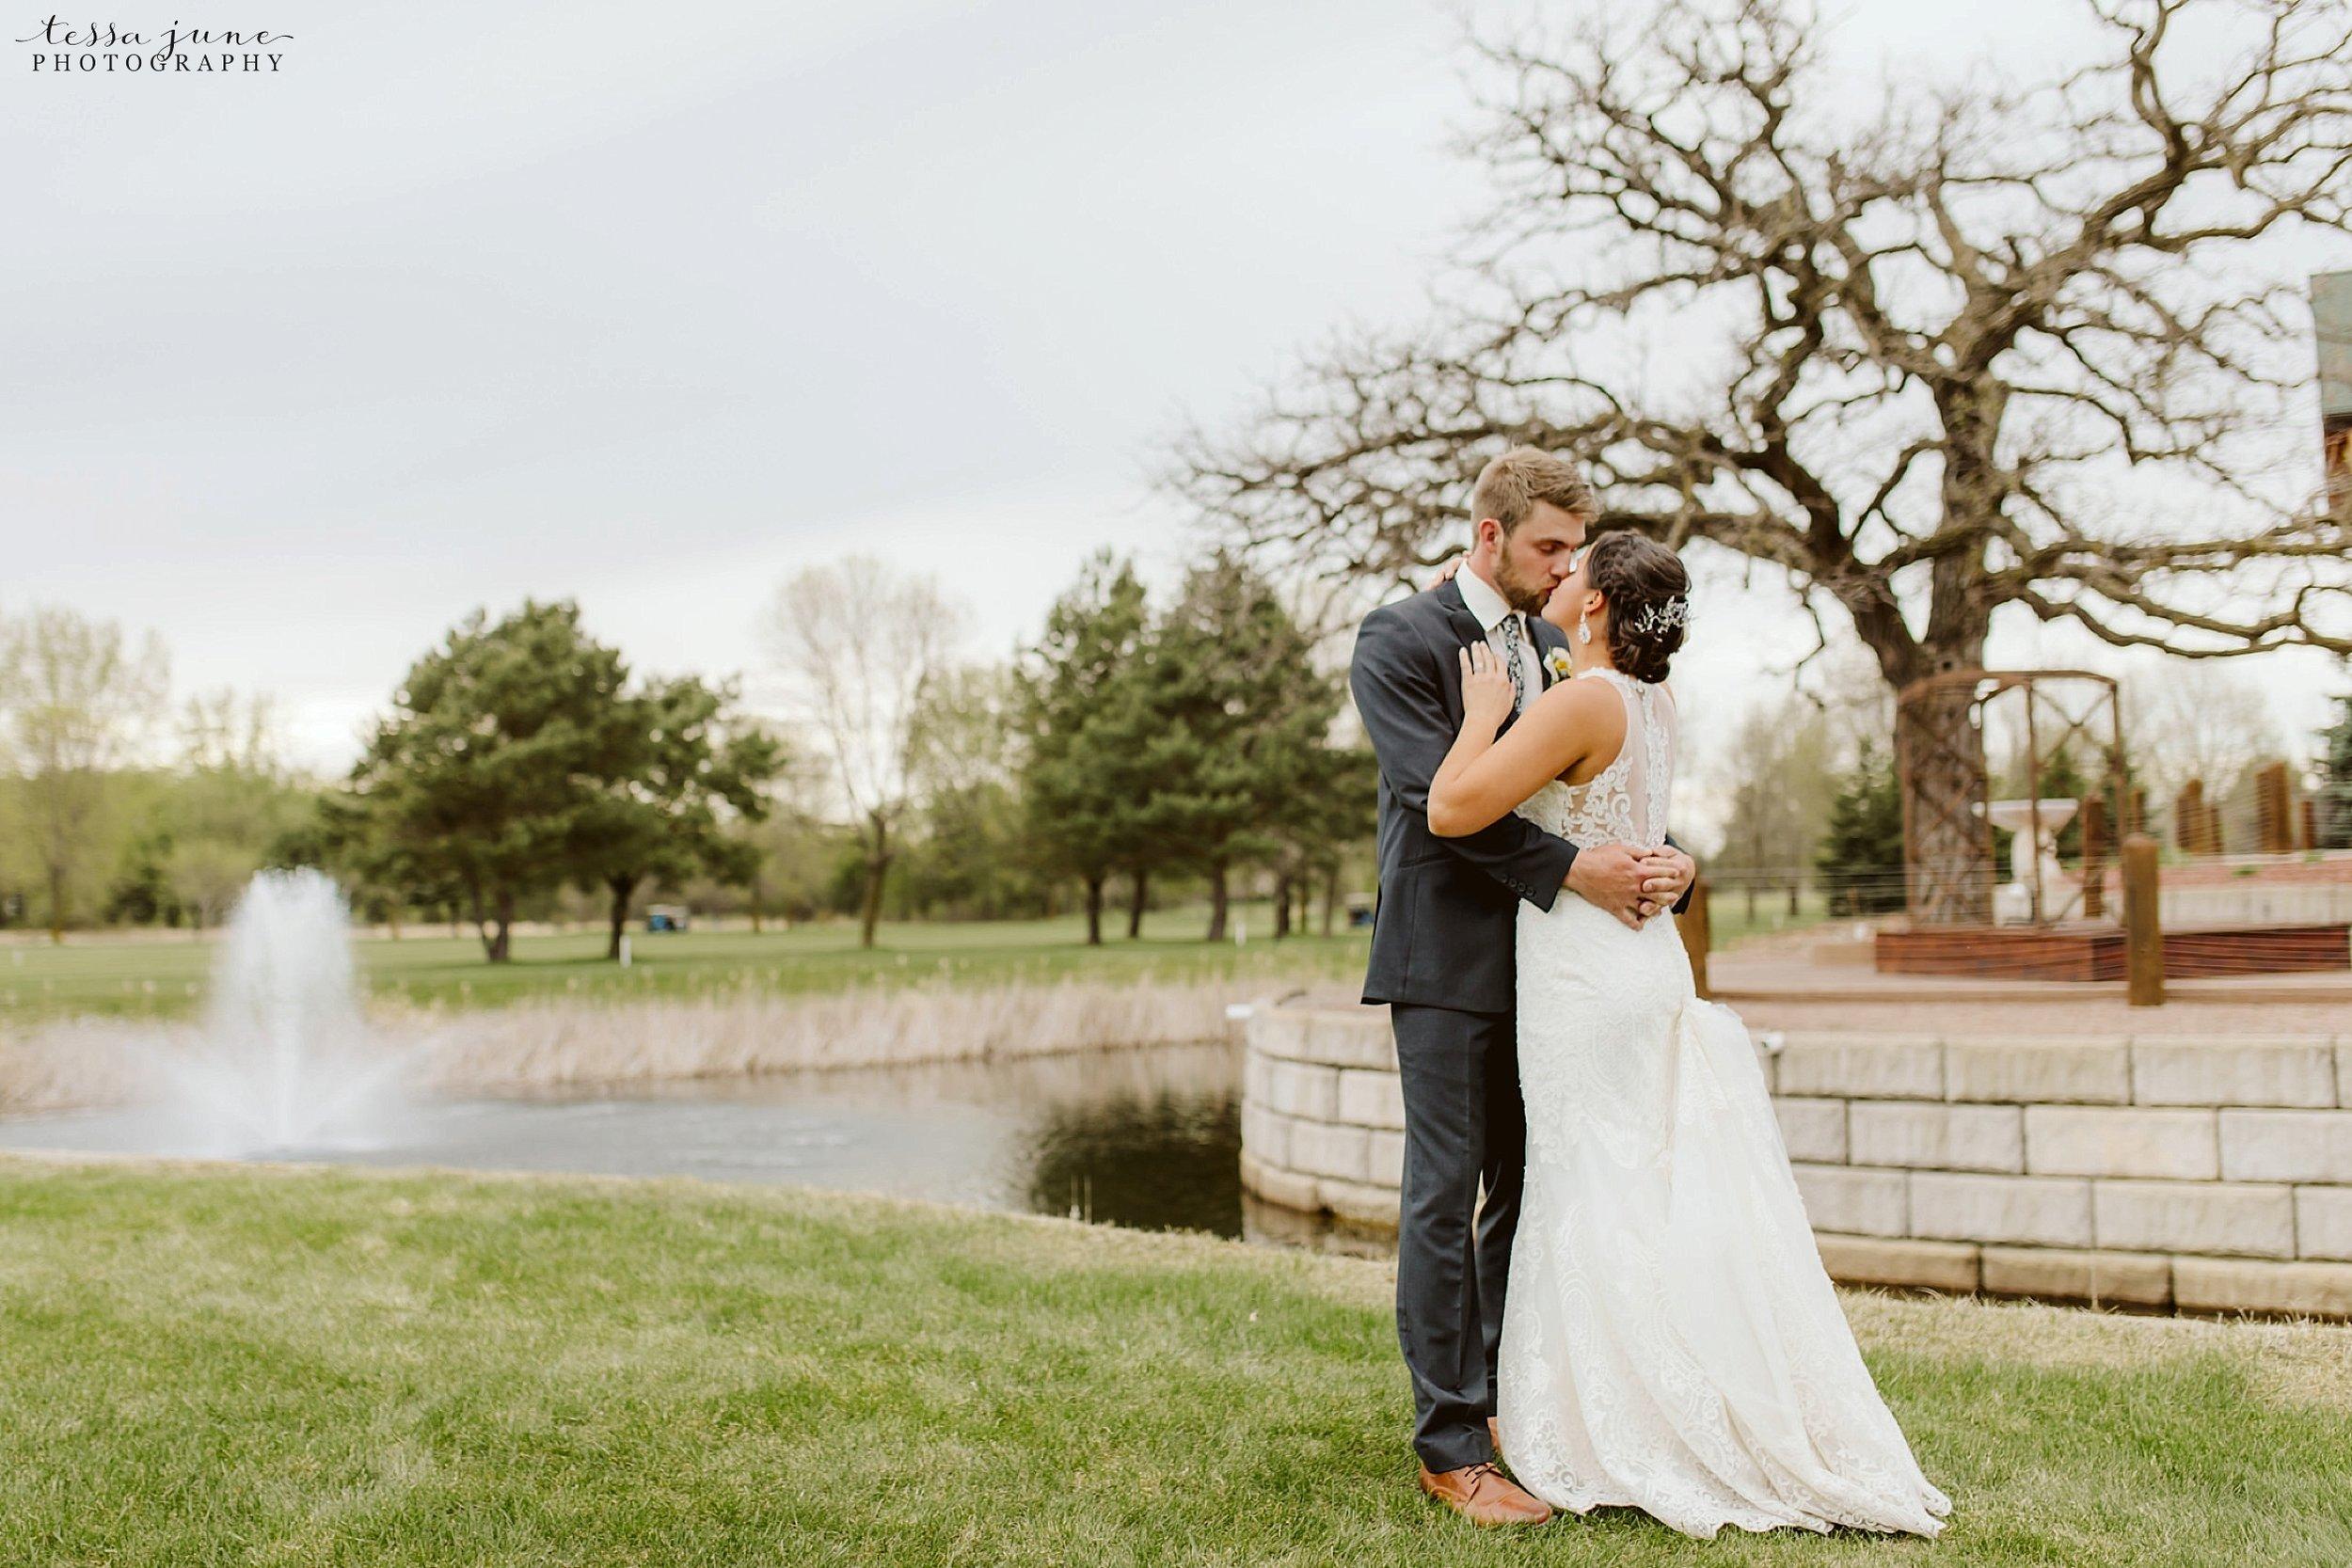 The-grands-at-mulligans-wedding-sartell-minnesota-spring-floral-spring-garden-wedding-136.jpg